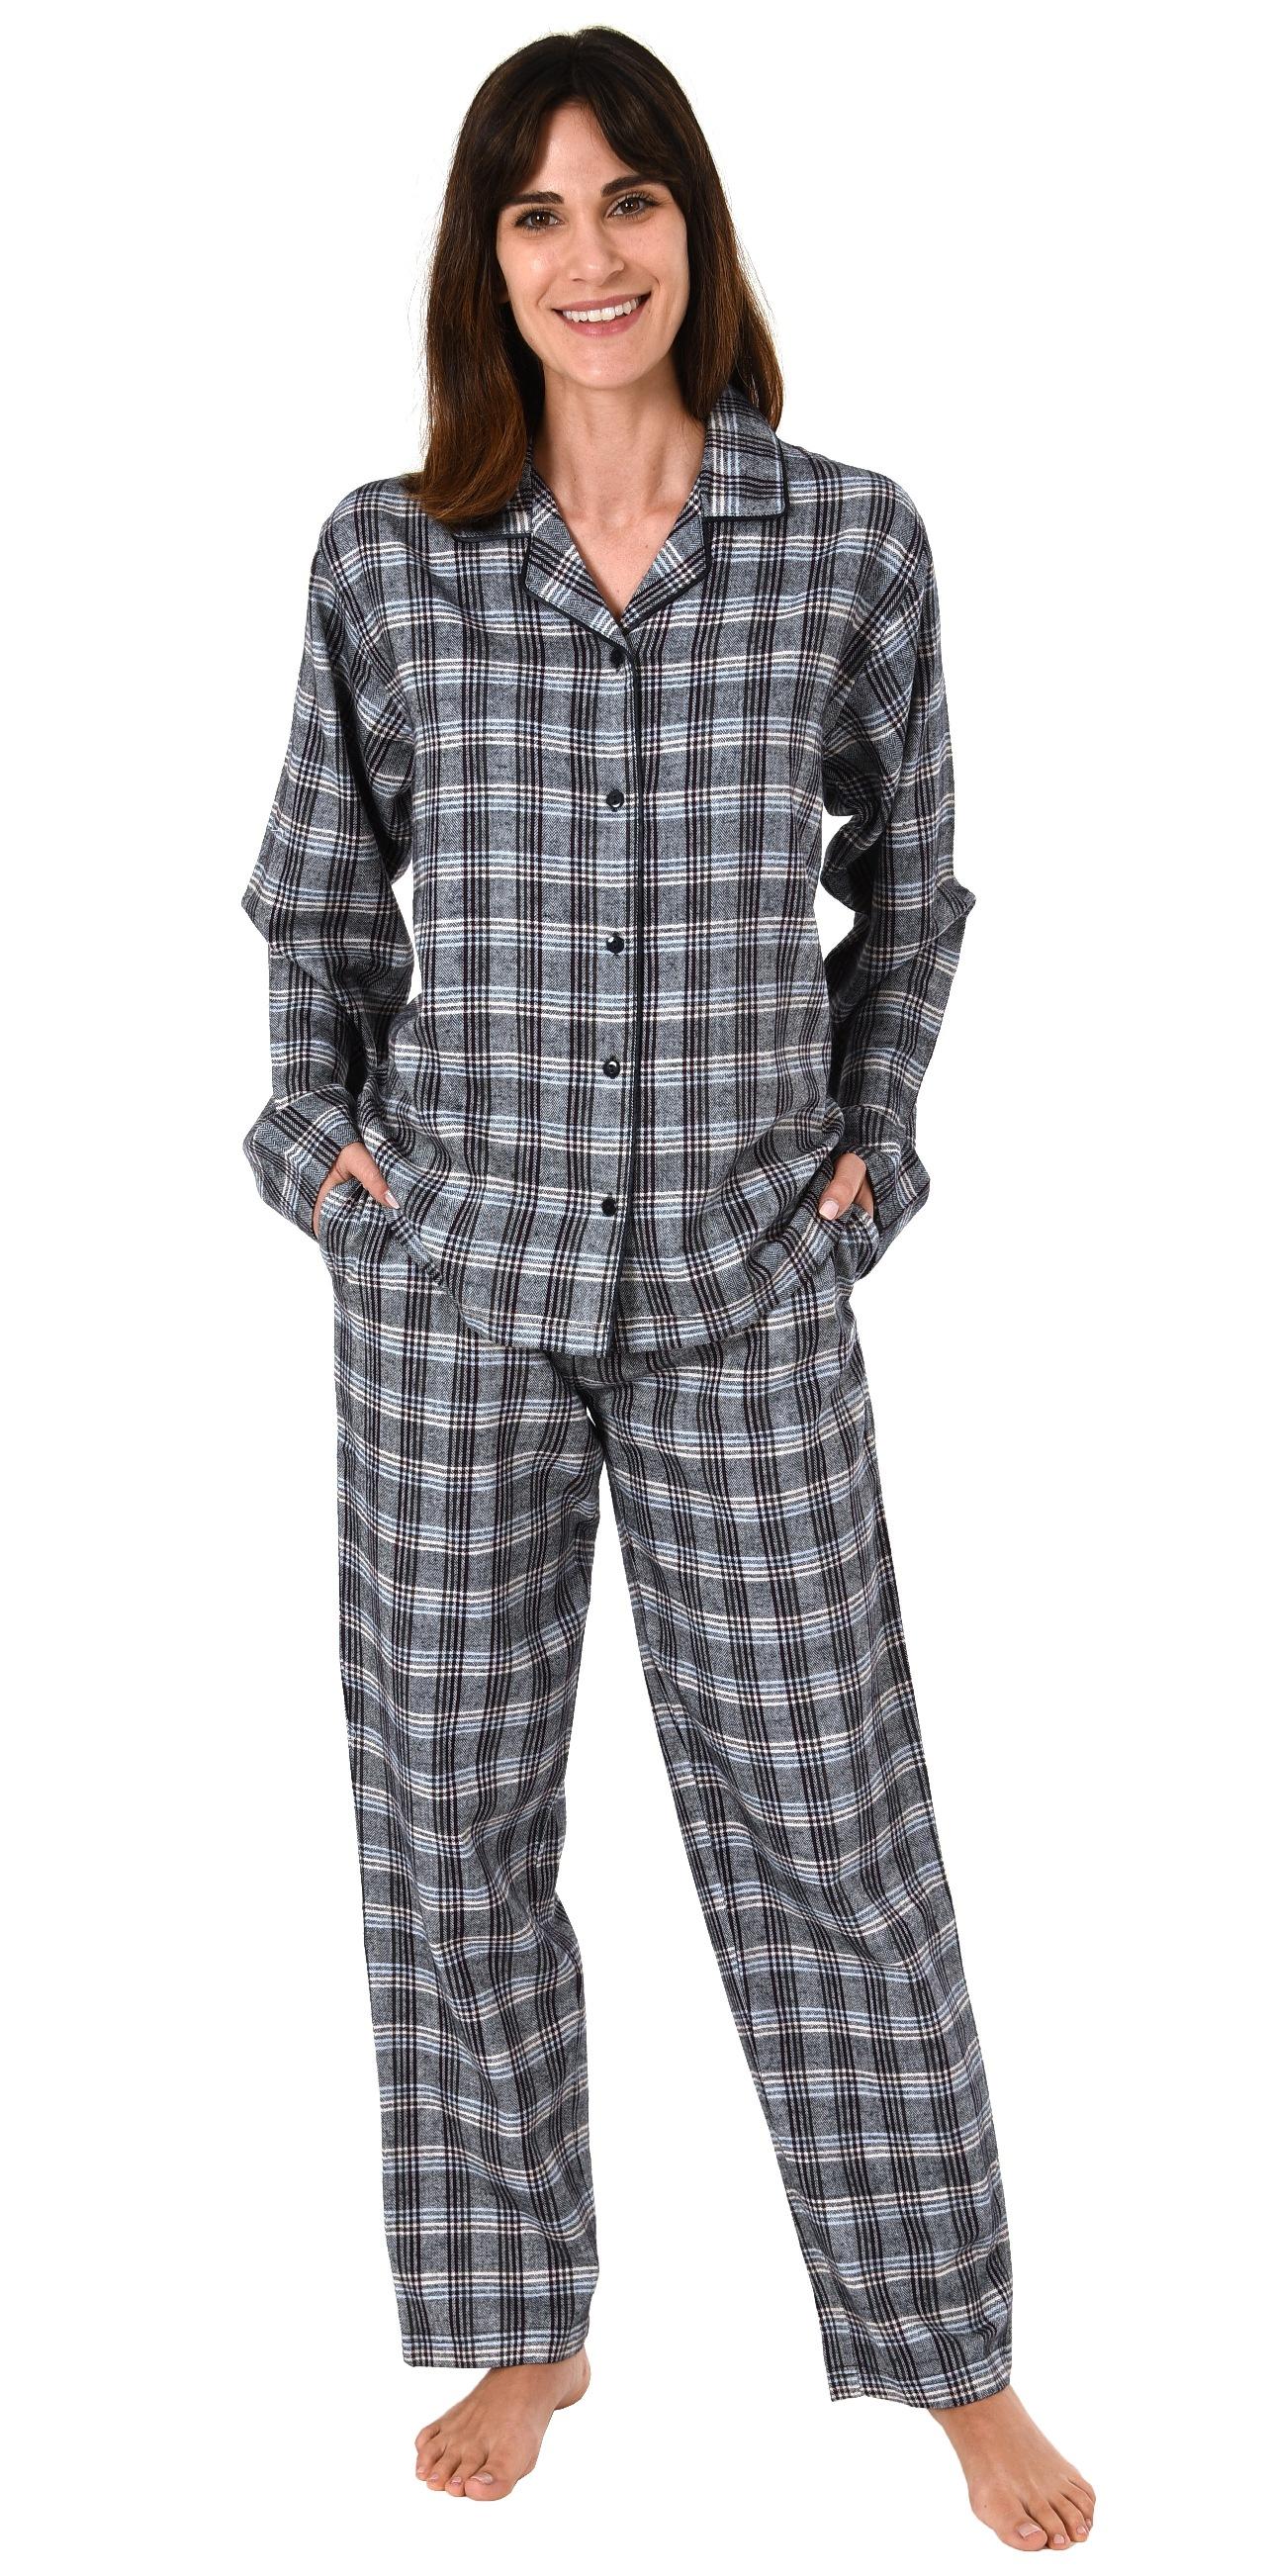 buy popular 3d35d 49fbd Damen Flanell Pyjama Schlafanzug langarm kariert – auch in Übergrößen 281  201 95 991